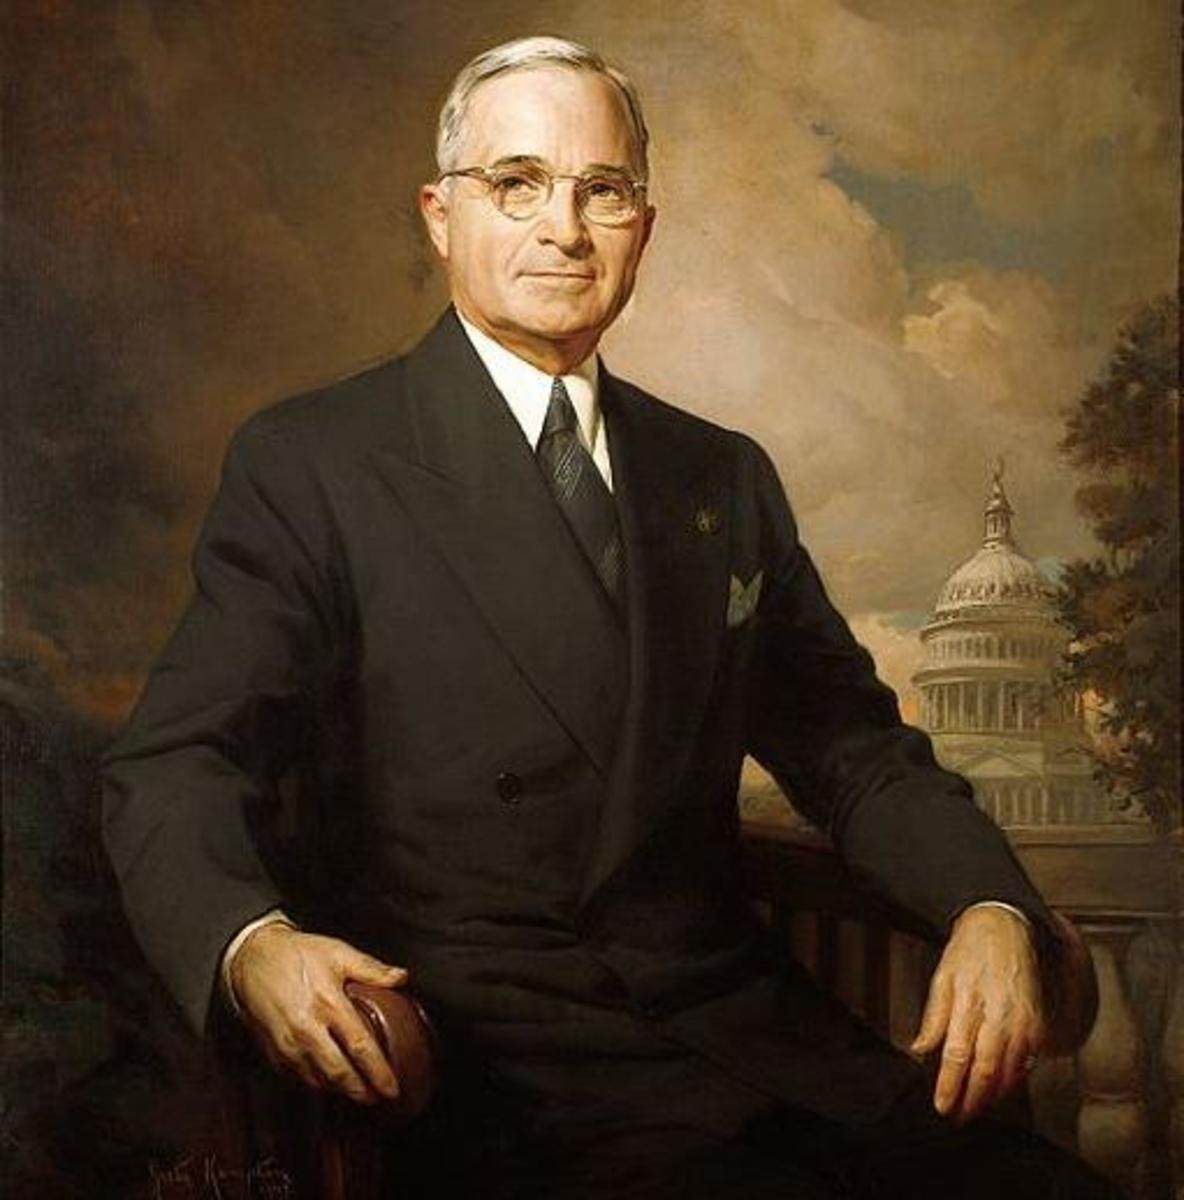 A portrait of Harry Truman.